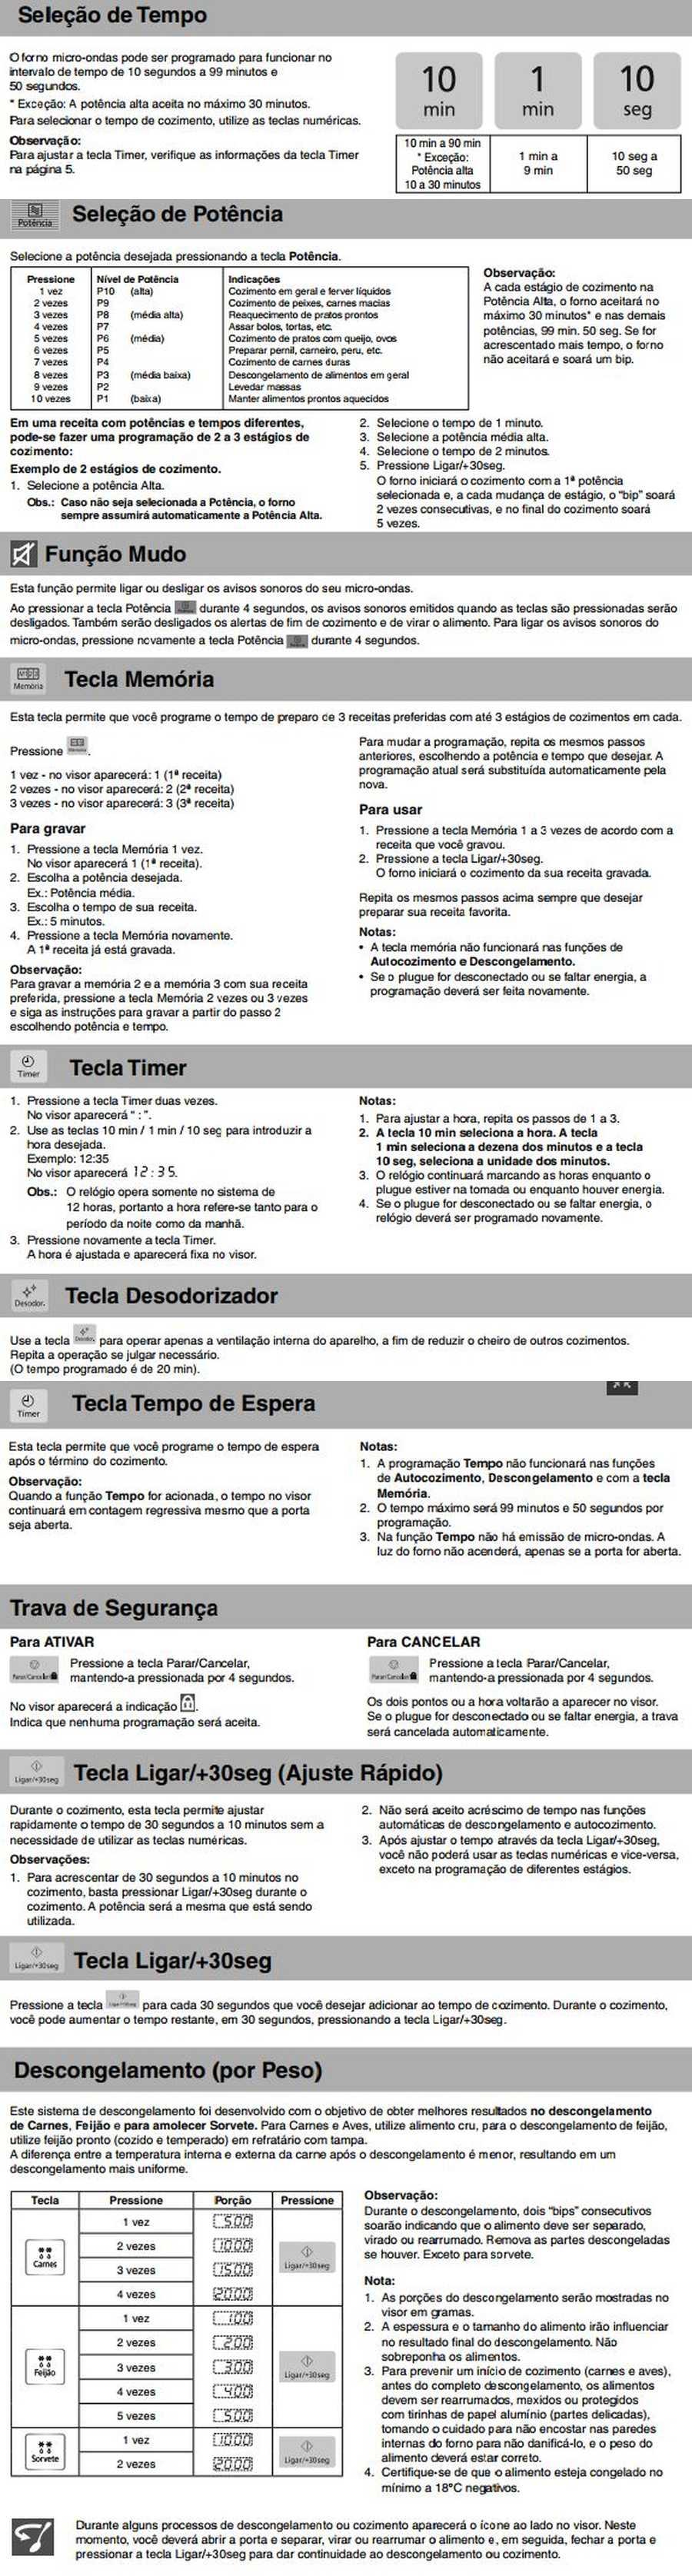 Manual de instruções do microondas Panasonic NN-35H - Funções - img